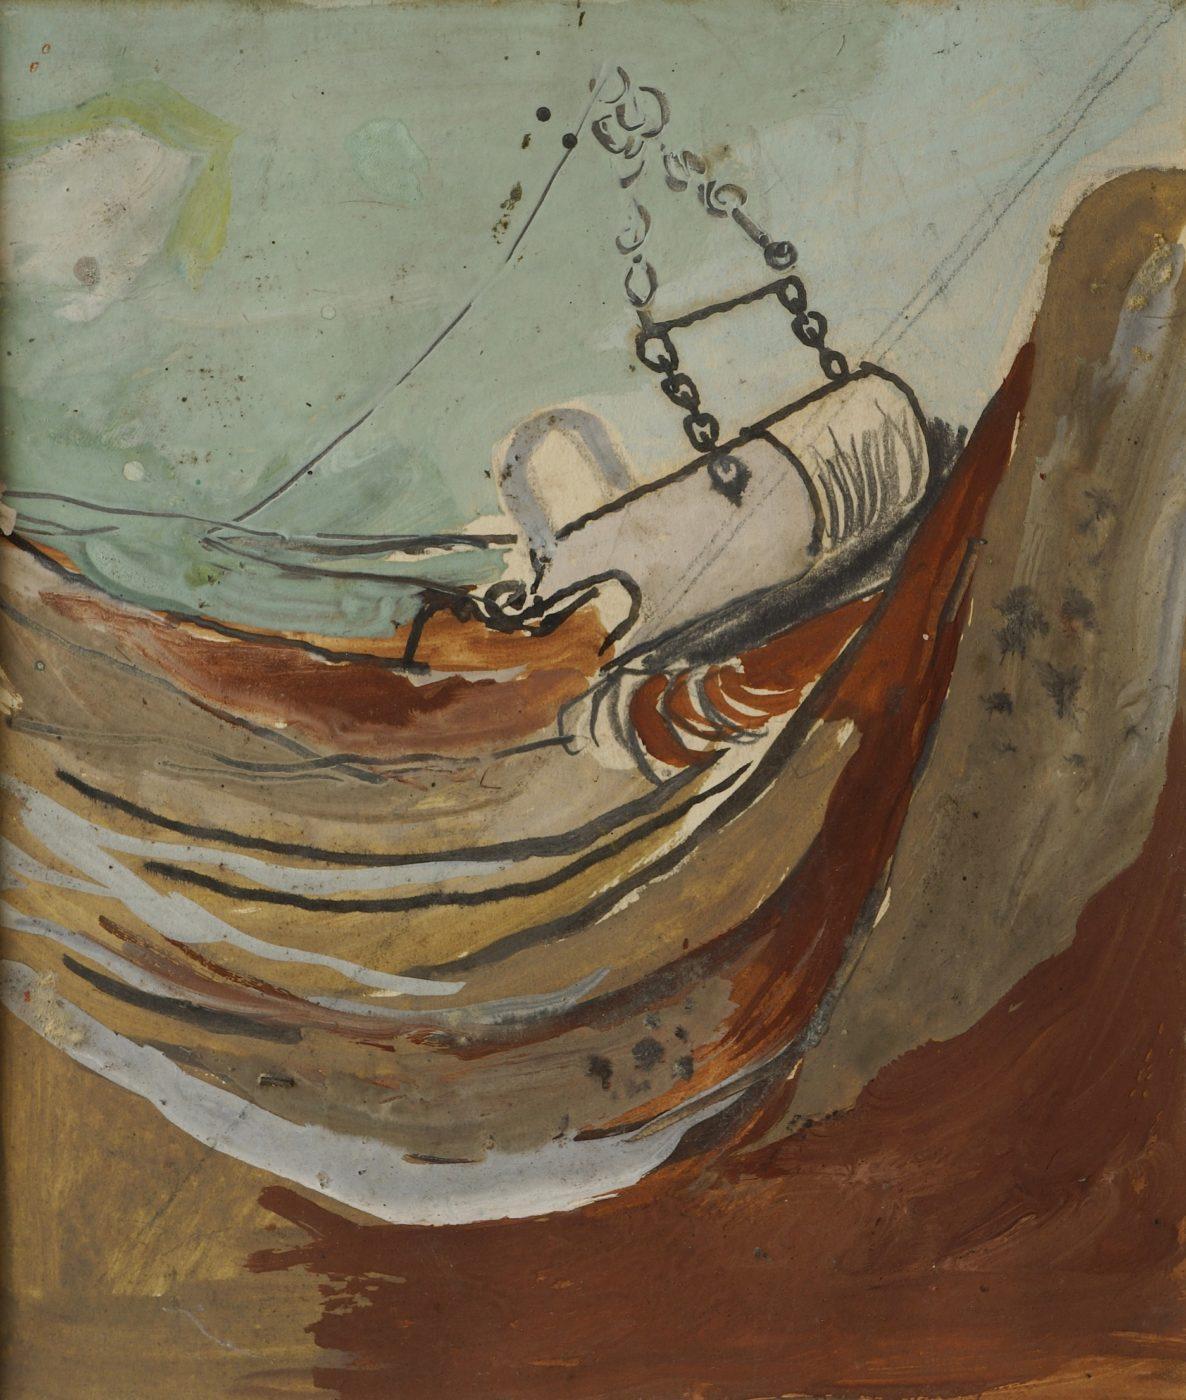 Graham Sutherland, OM (1903-1980), Dragline Bucket Excavating Overburden